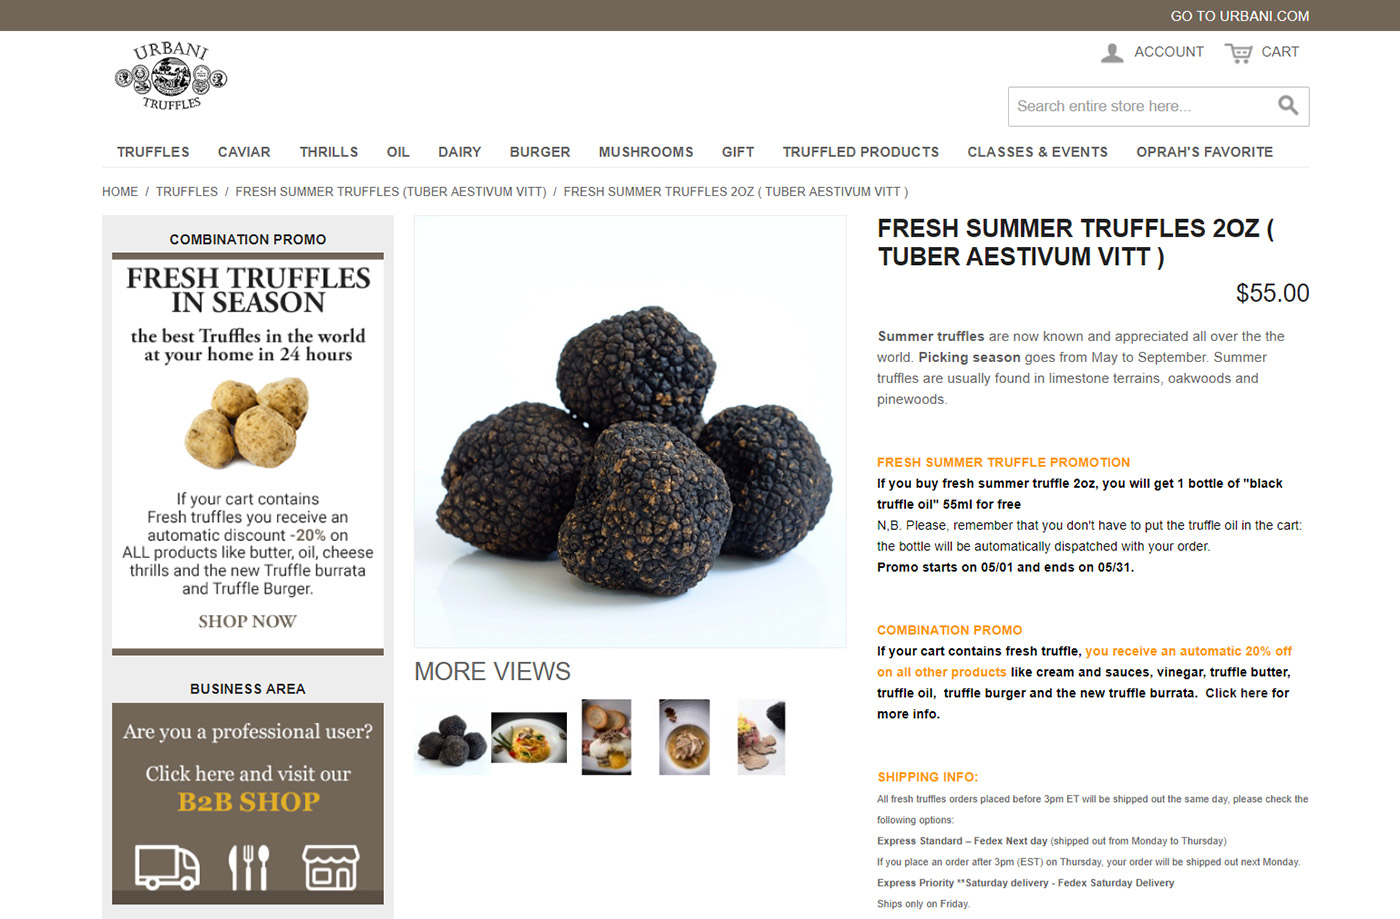 Urbani Truffles USA, ecommerce tartufi